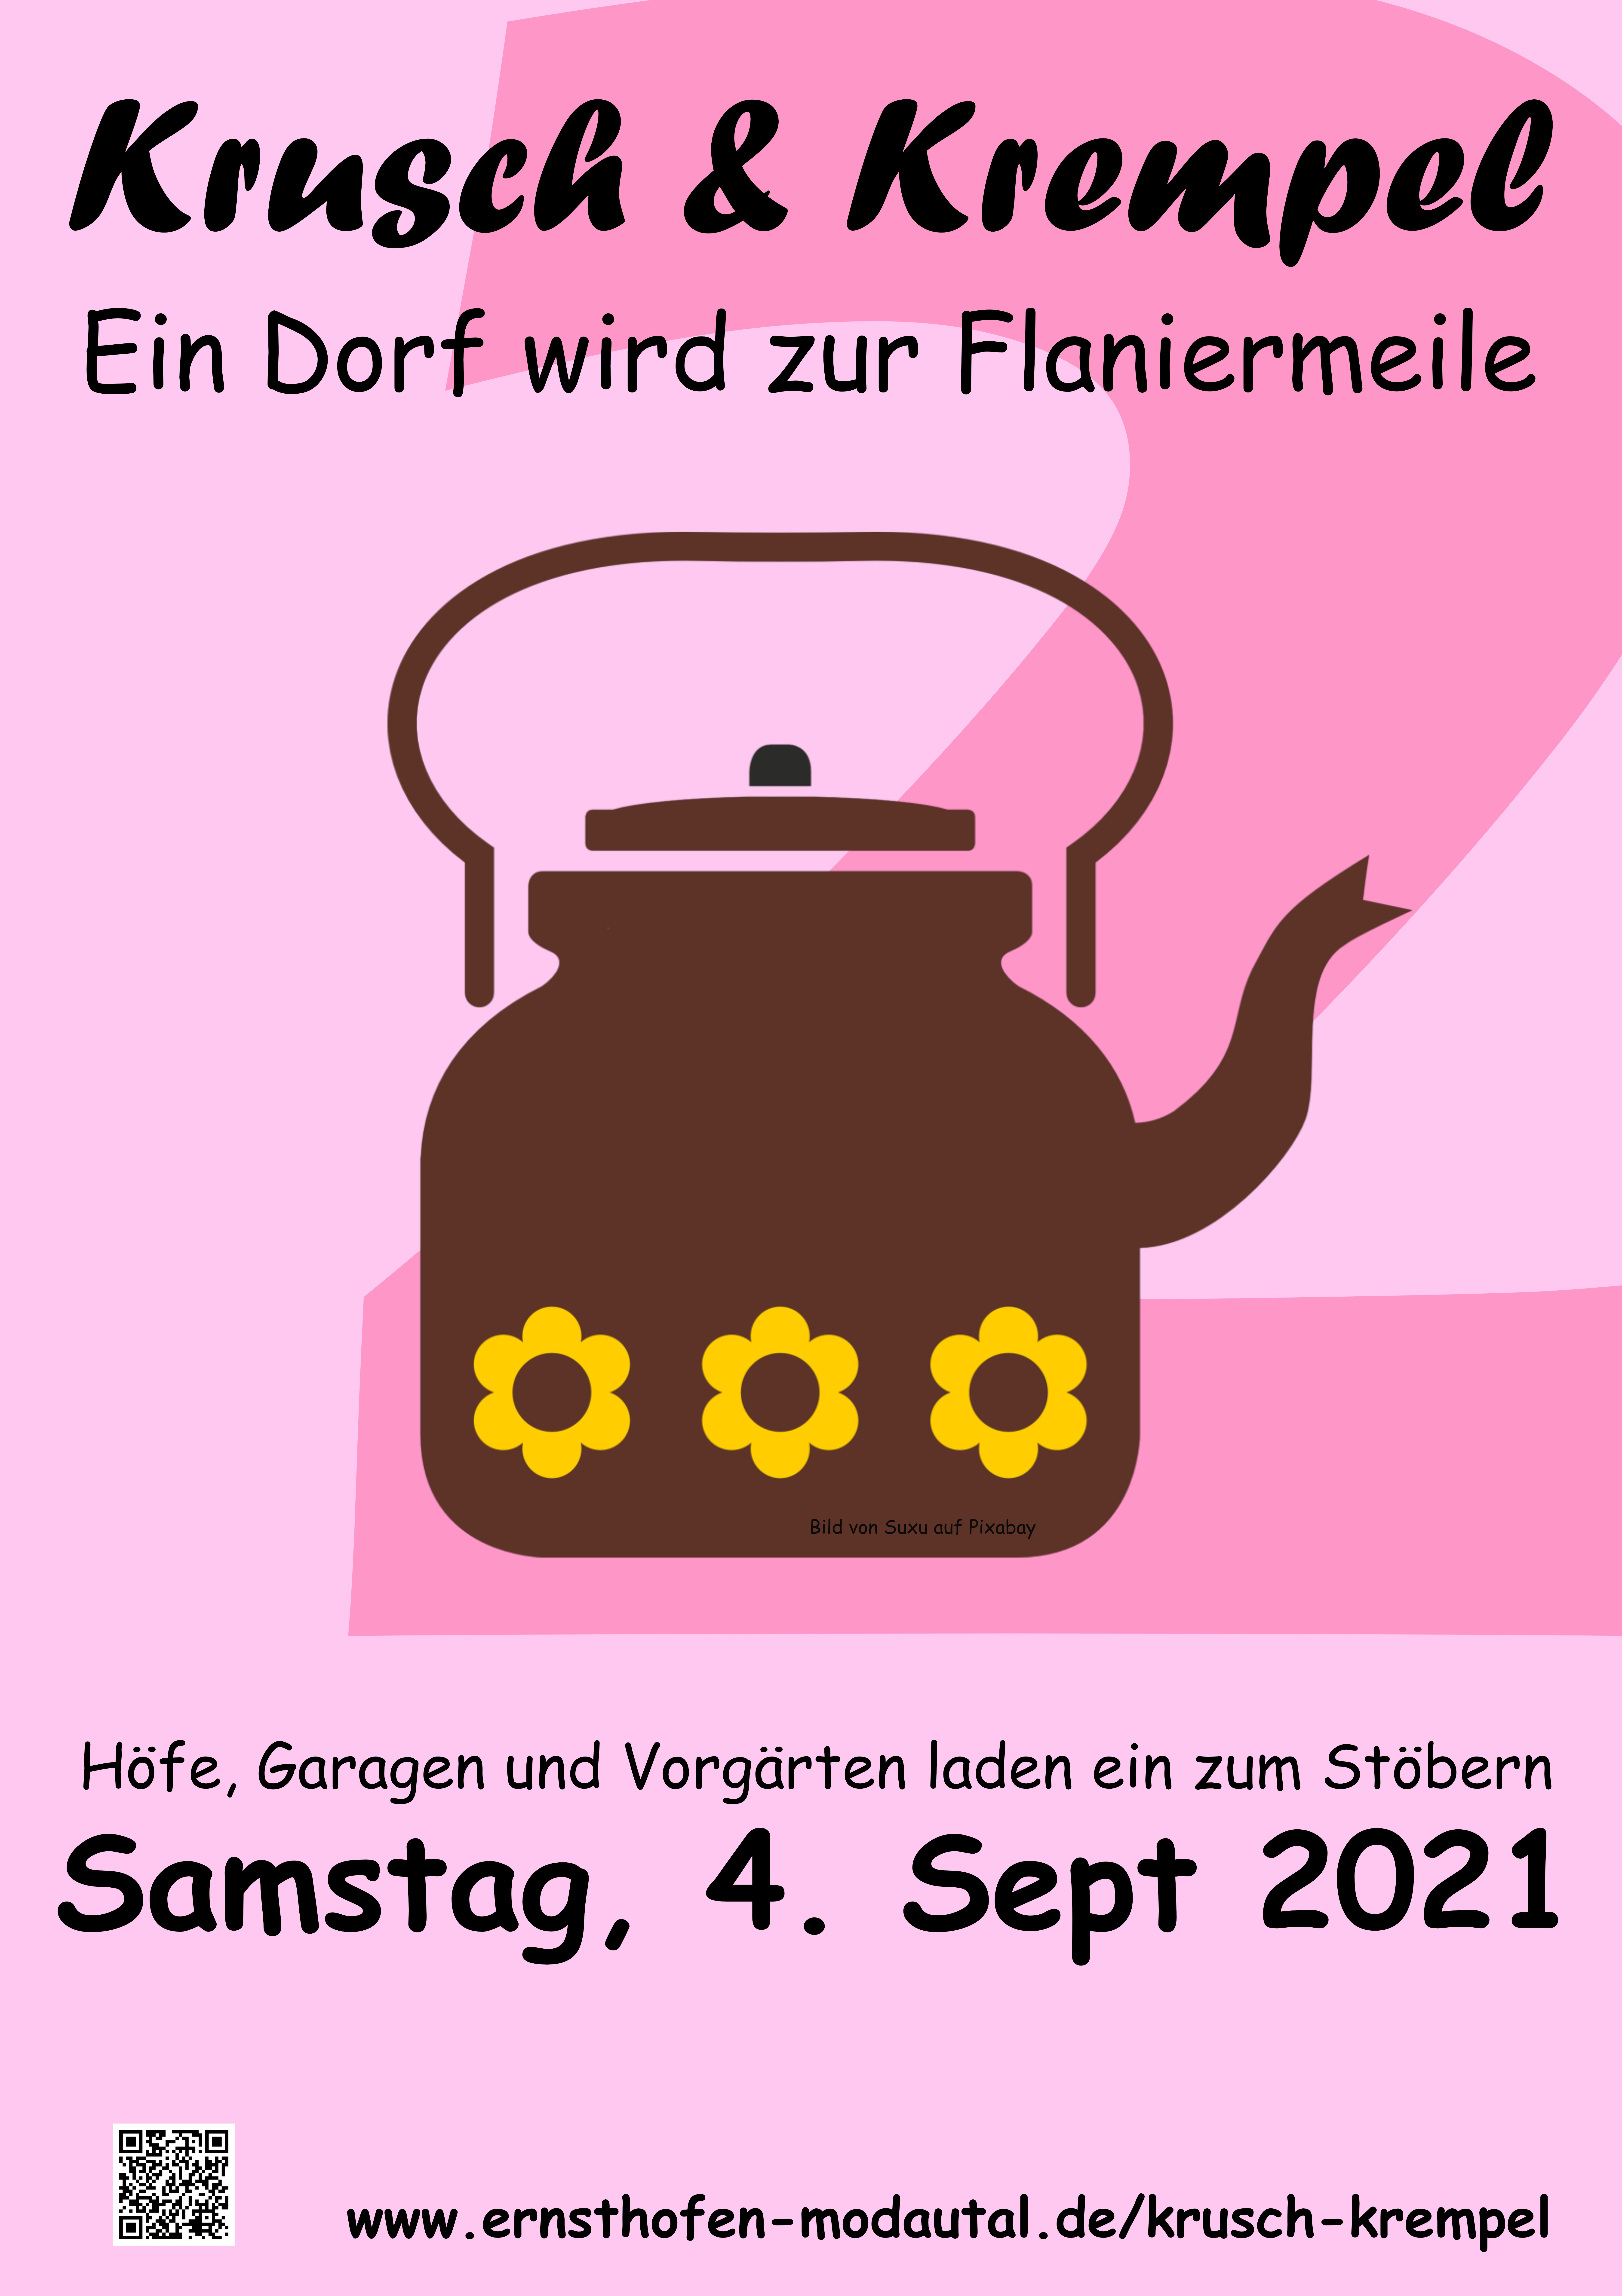 KK2 Plakat vorlaeufig - Krusch & Krempel